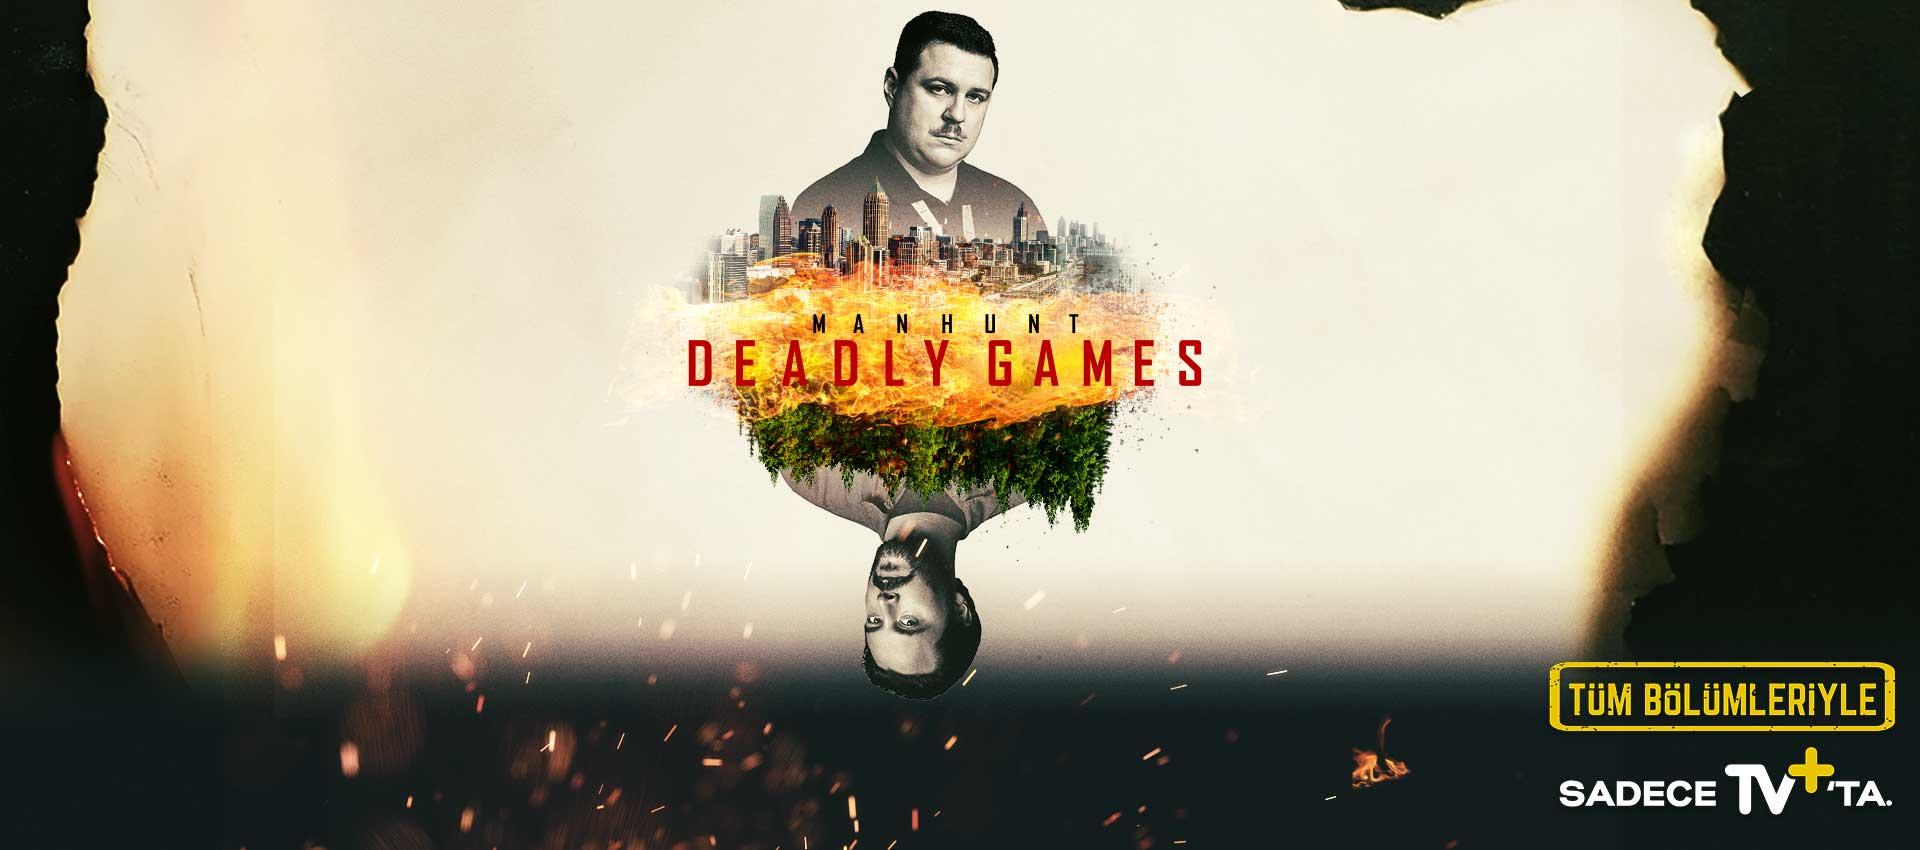 Manhunt Deadly Games izle türkçe izle hd izle